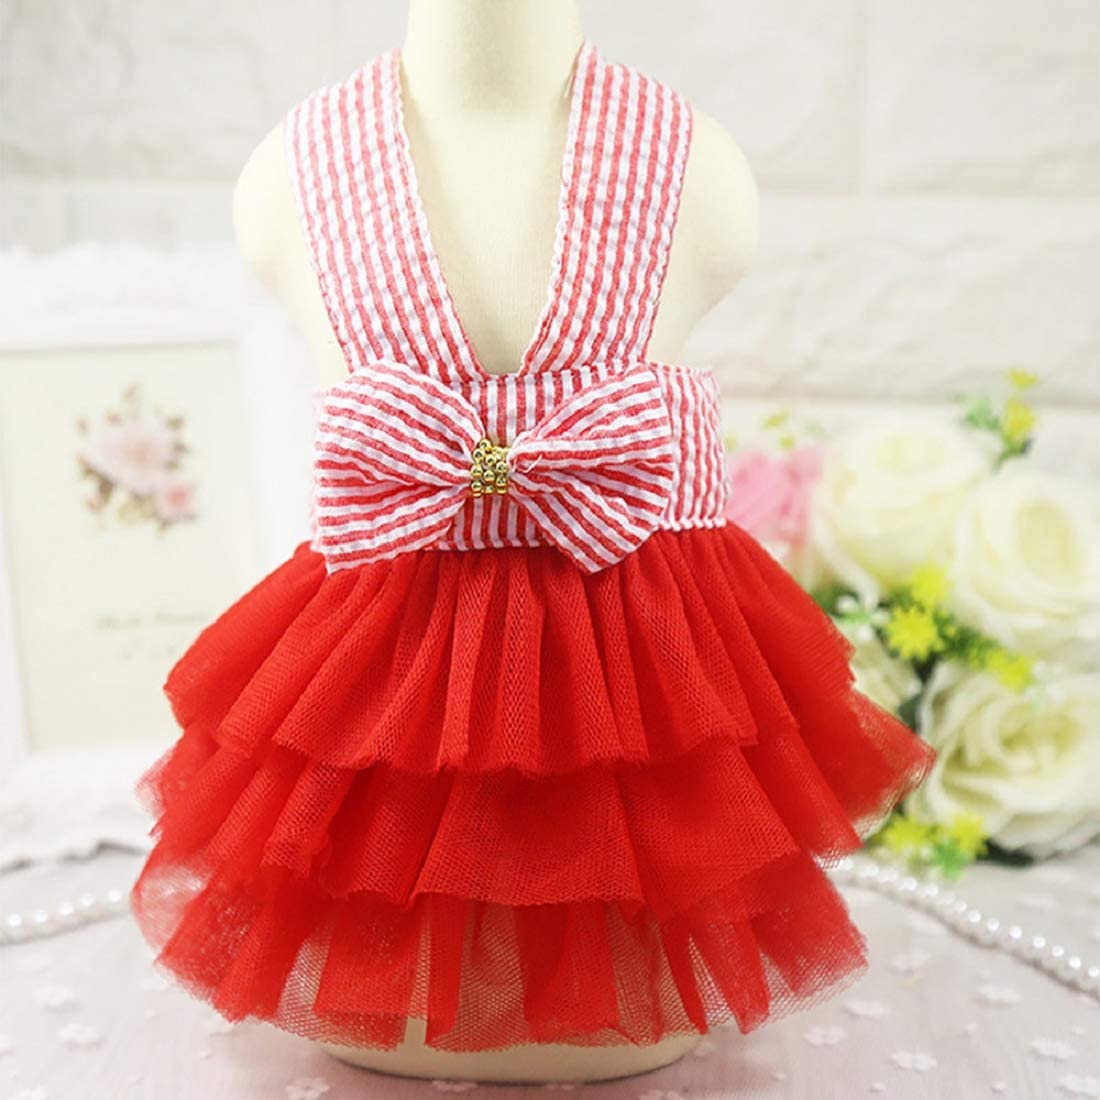 Girl Dog Stripe Print Dress Lace Bowknot Tutu Dresses Pet Cat Puppy Costumes Apparel Skirt Clothes